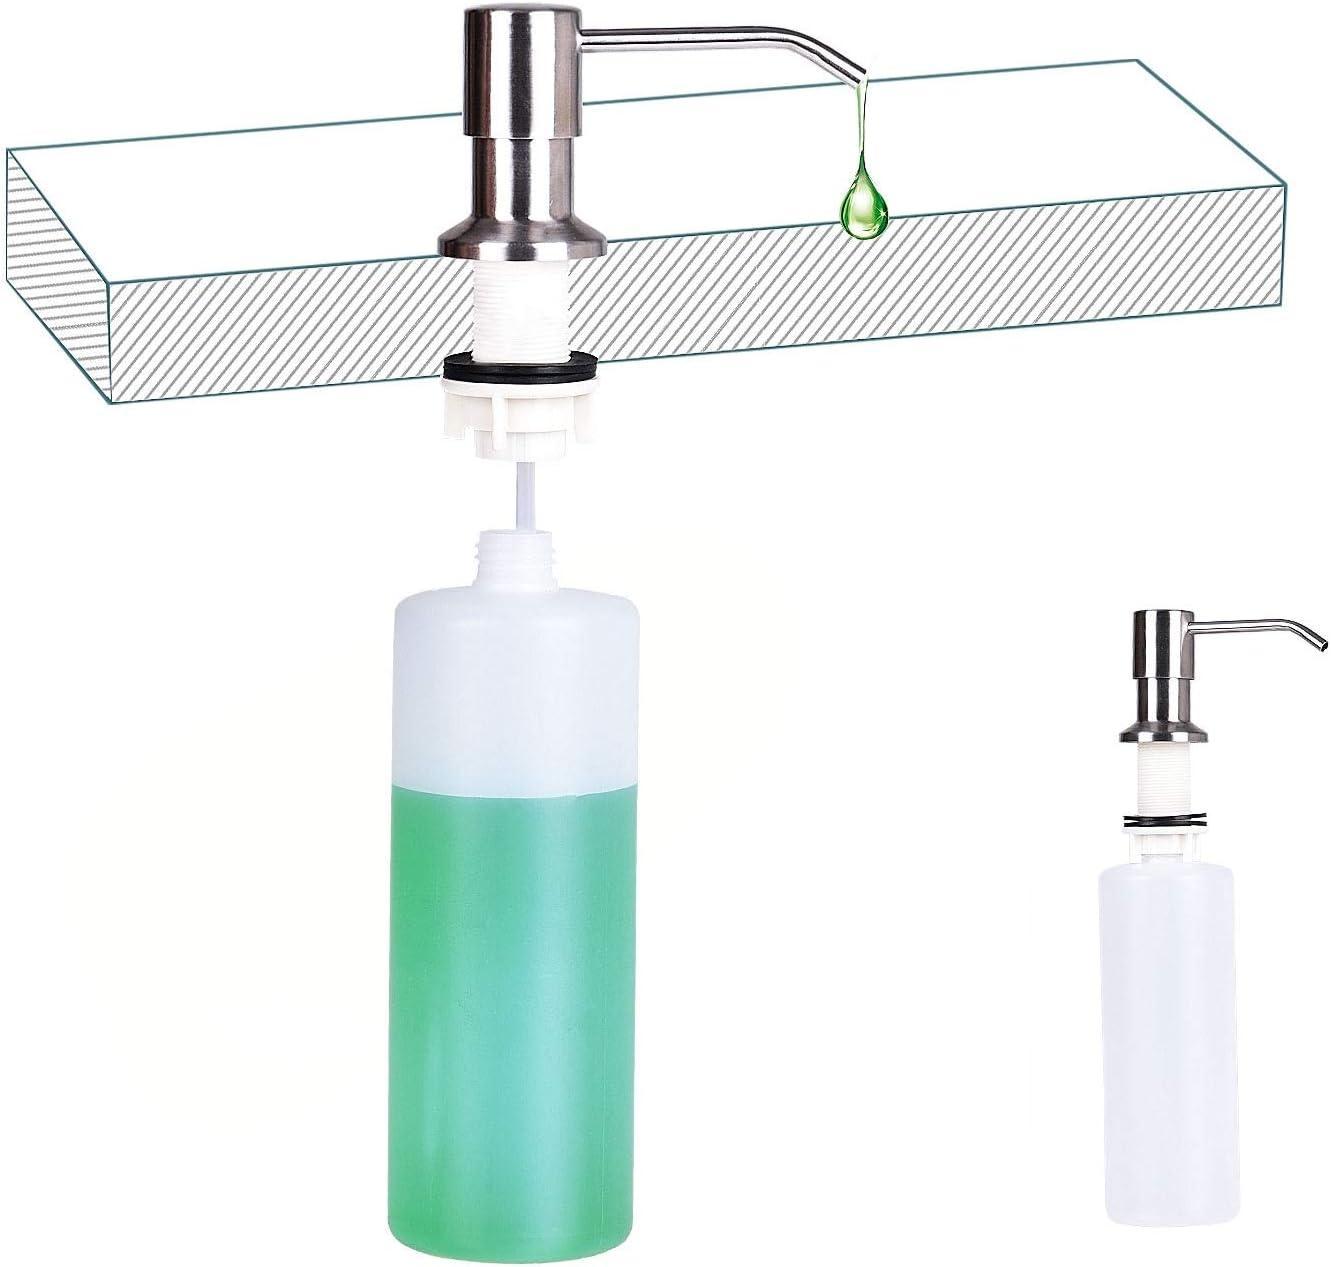 500ml Kitchen Sink Soap Dispenser, Stainless Steel Pump Head Lotion Dispenser for Kitchen Sink, Replacement Liquid soap Bottle Built in Hand Sink Pump (Brushed Nickel)